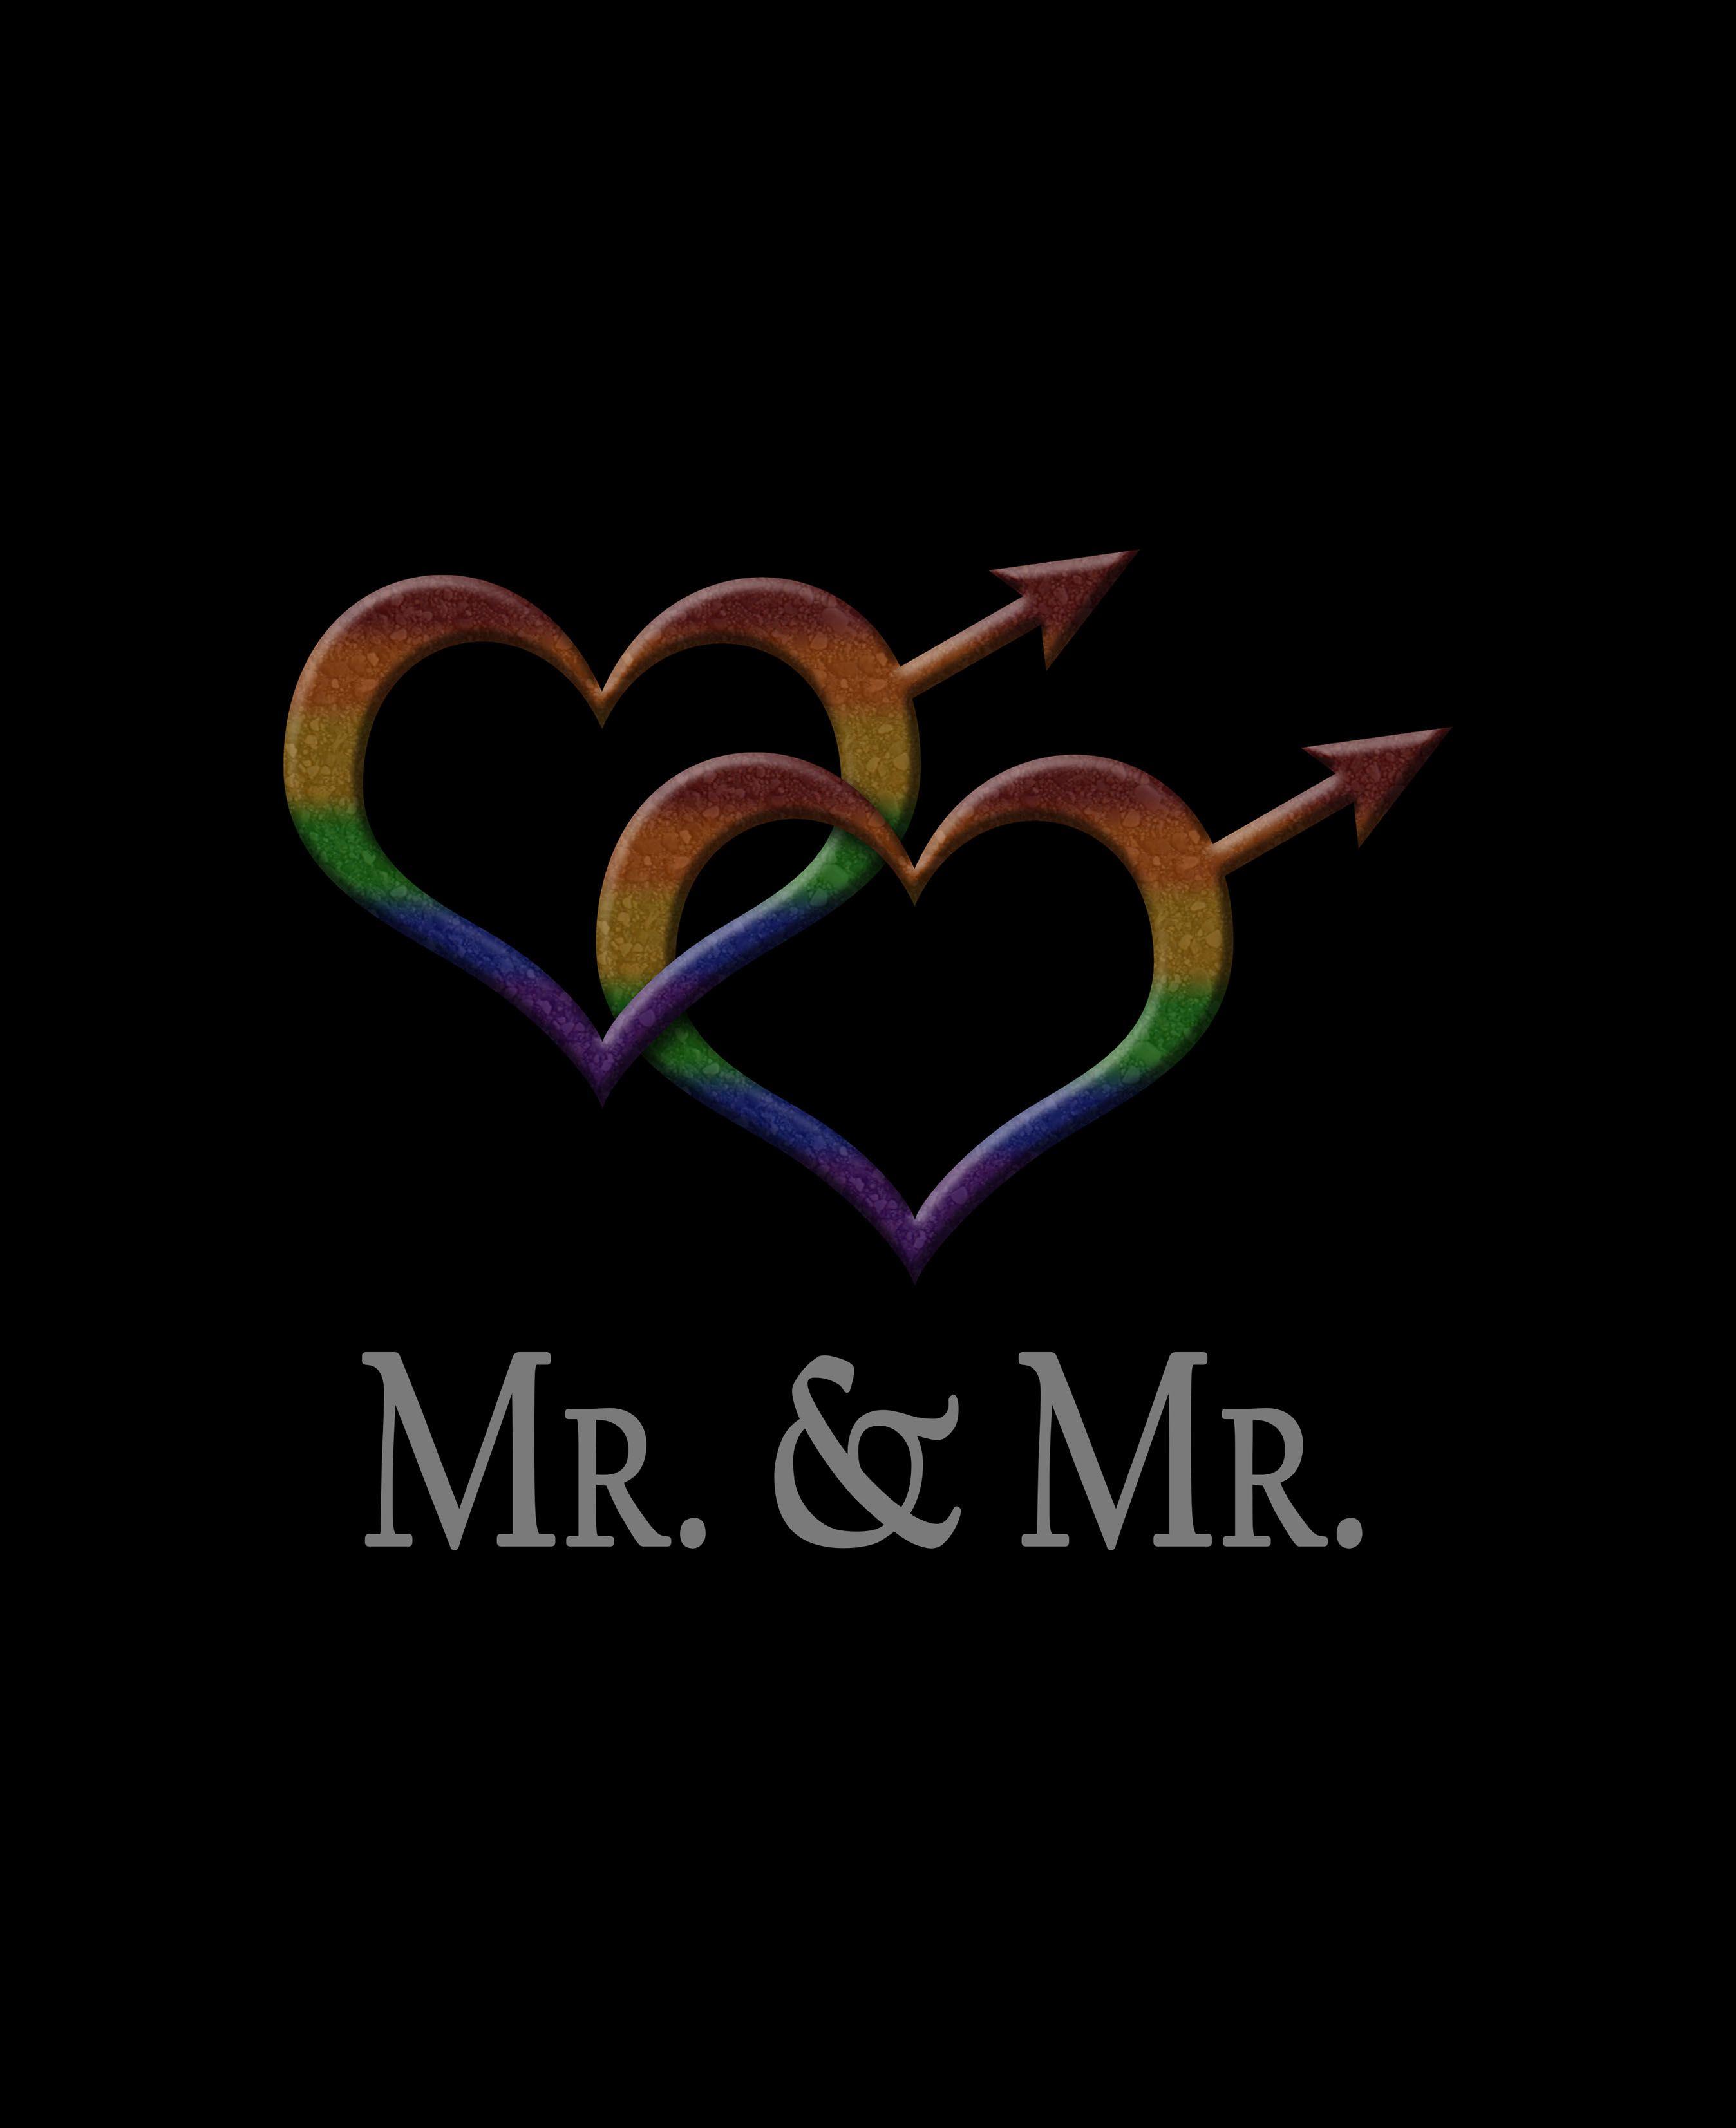 Mr Mr Gay Pride With Linked Heart Shaped Gender Symbols Click